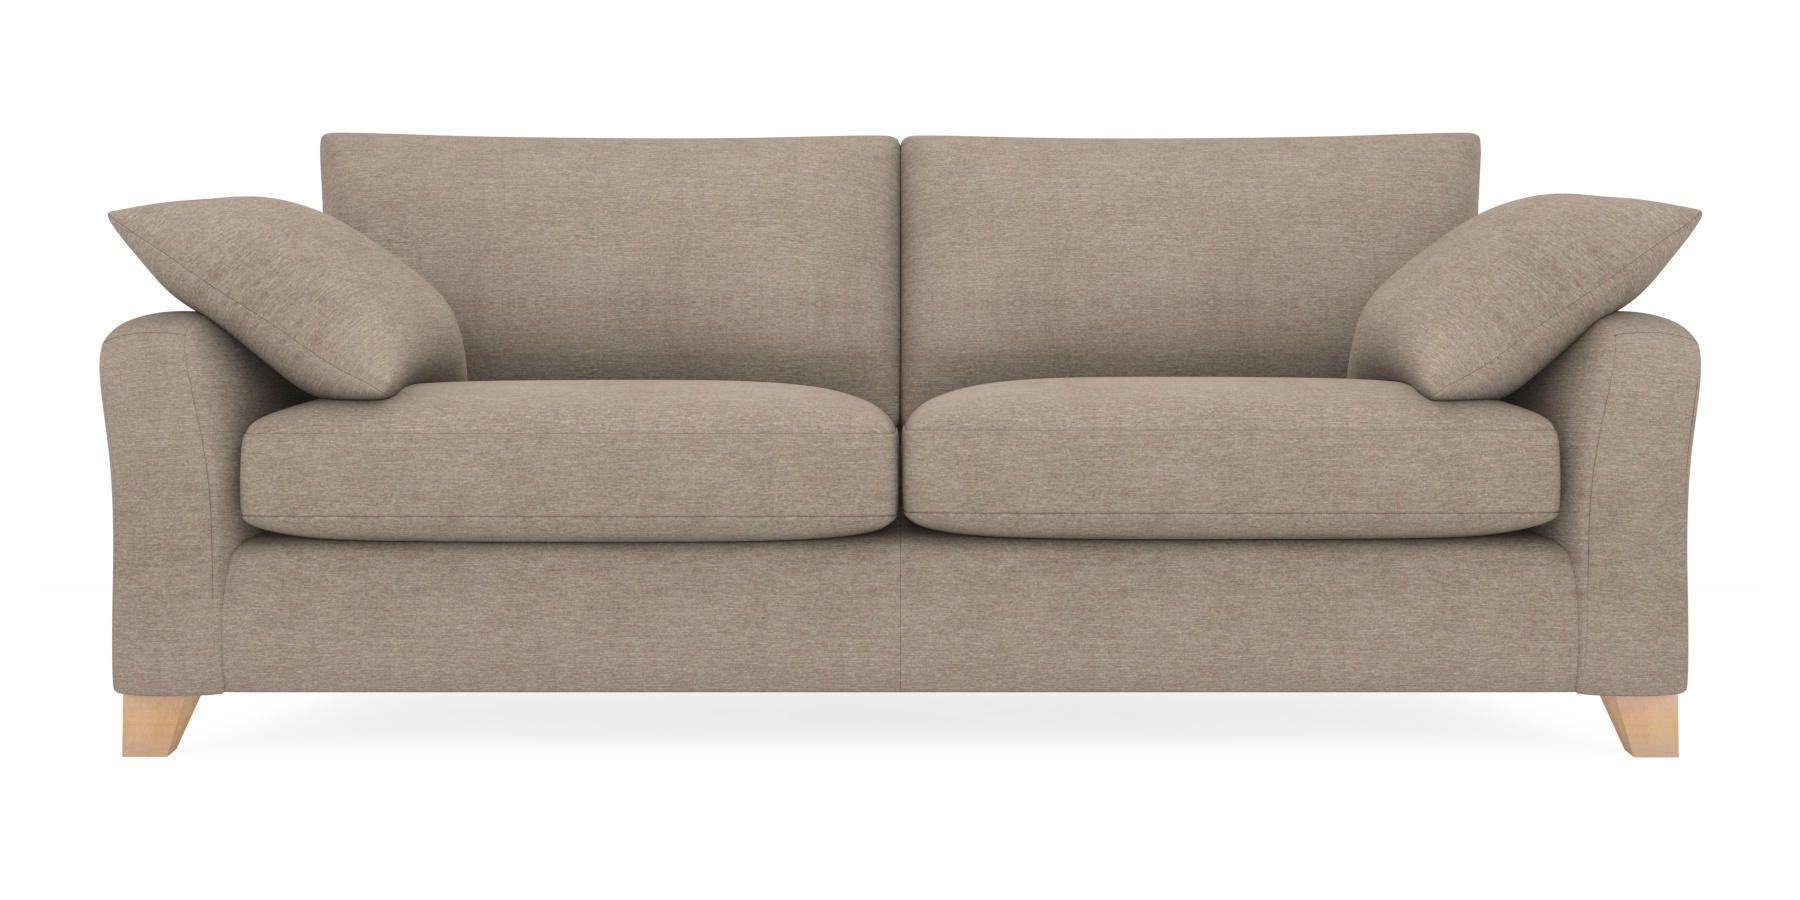 Buy Alexis Extra Large Sofa (4 Seats) Soft Marl Dark Mink Low ...